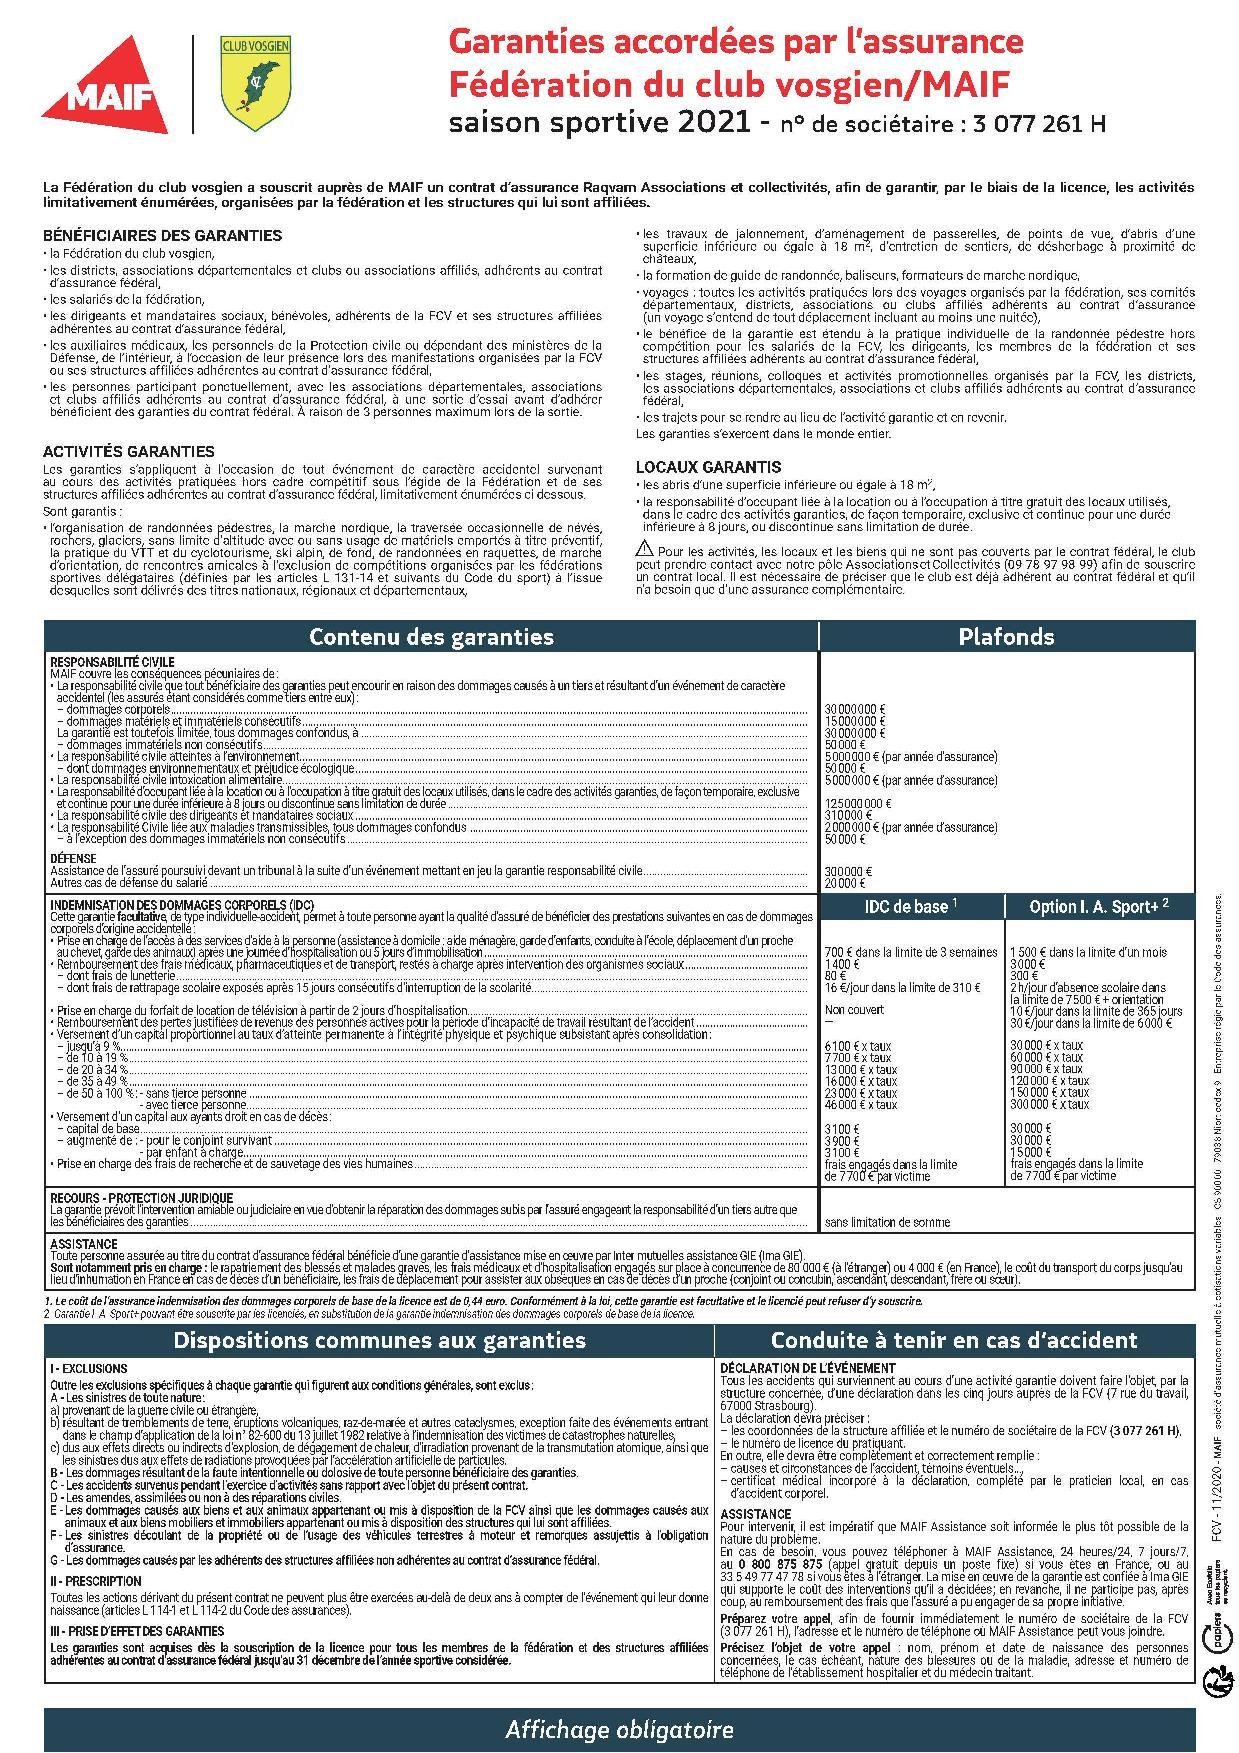 Assurance fédérale - Garantie